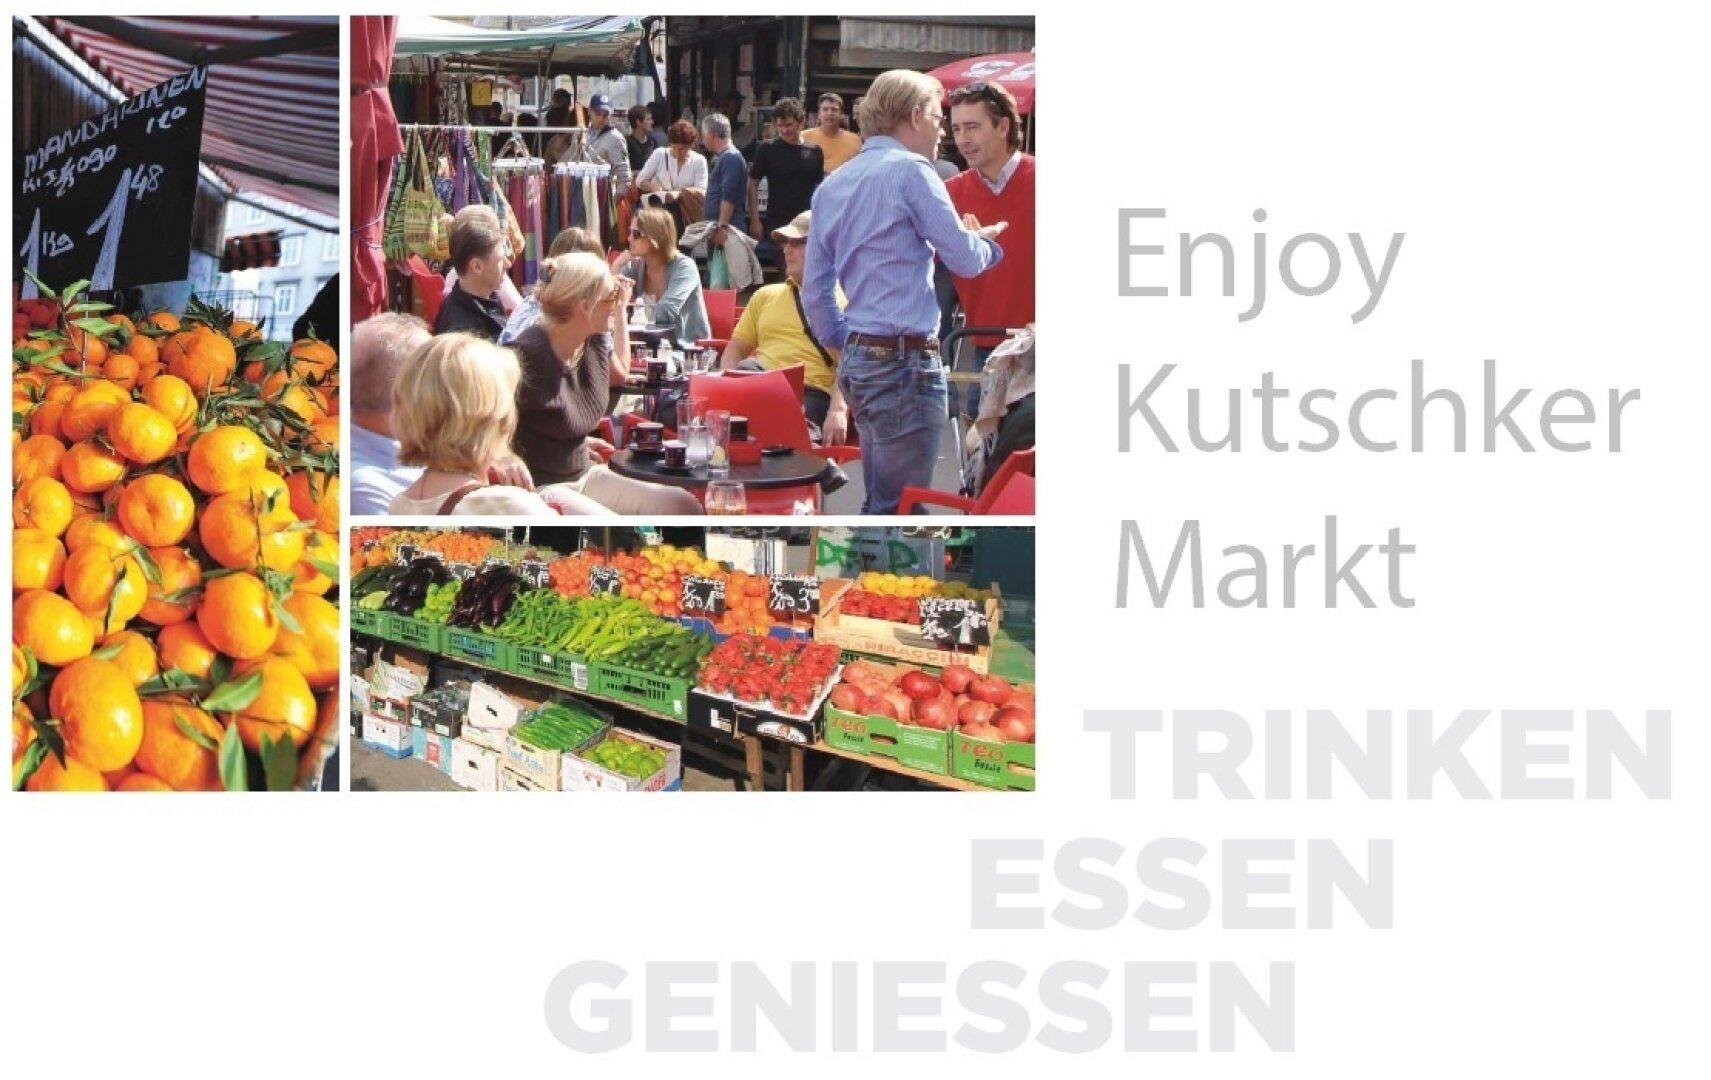 Enjoy Kutschkermarkt